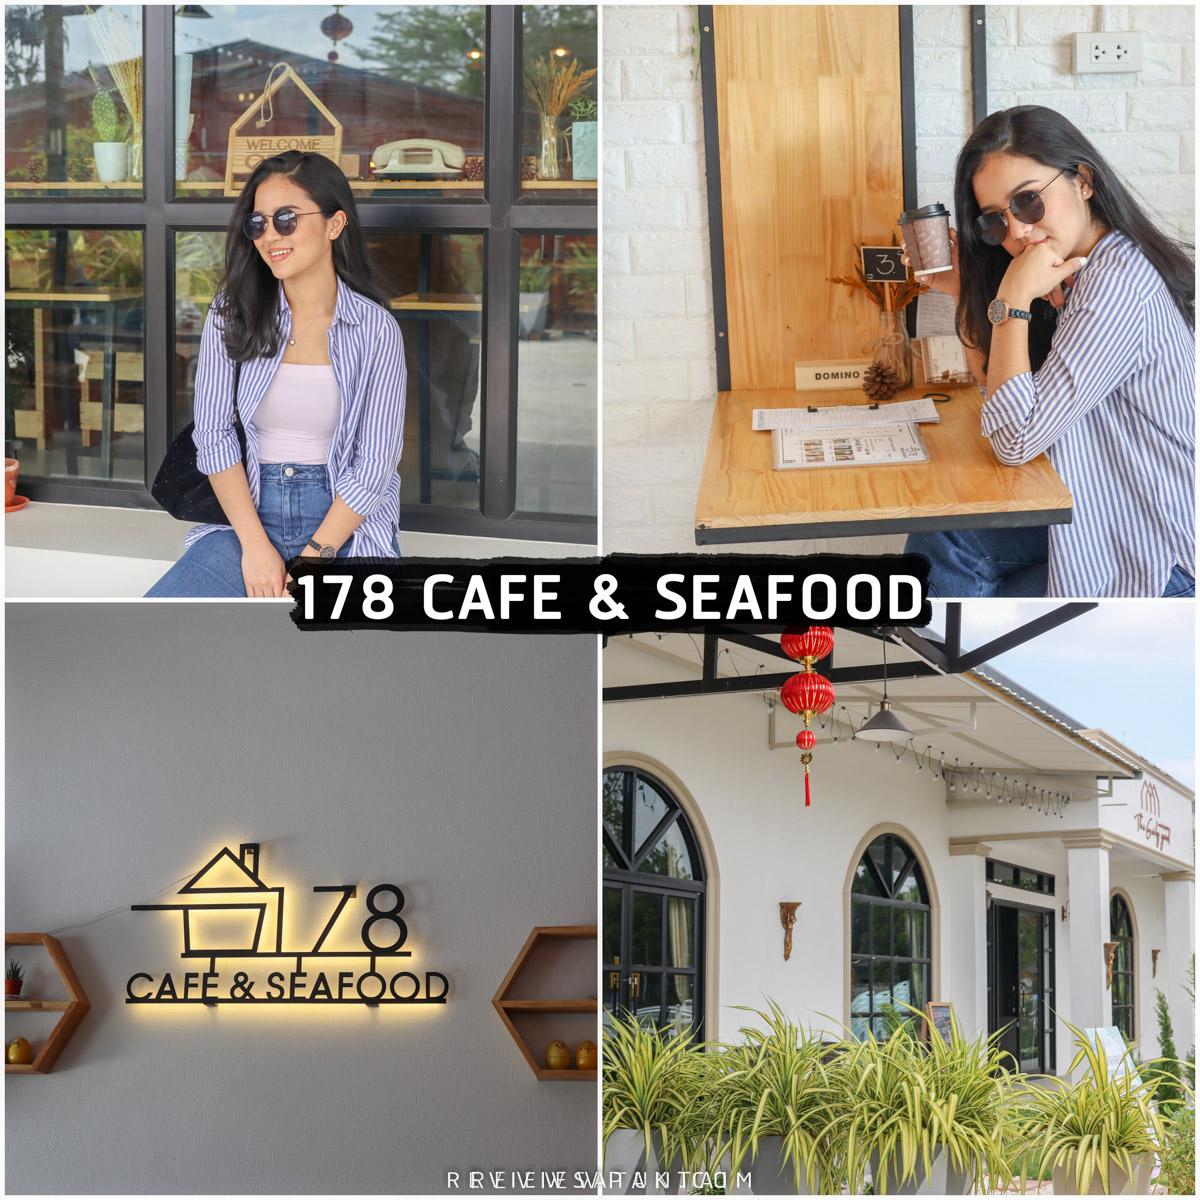 178-Cafe---Seafood-ร้านอาหารร้านเด็ดติดอันดับของสตูล-อร่อยจริงอะไรจริง-พร้อมมีมุมคาเฟ่สไตล์มินิมอลสวยๆ-รายละเอียด-คลิก  จุดเช็คอิน,หลีเป๊ะ,สตูลสดยกกำลังสาม,satunwonderland,เที่ยวเมืองไทยAmazingกว่าเดิม,ชีพจรลงSouth